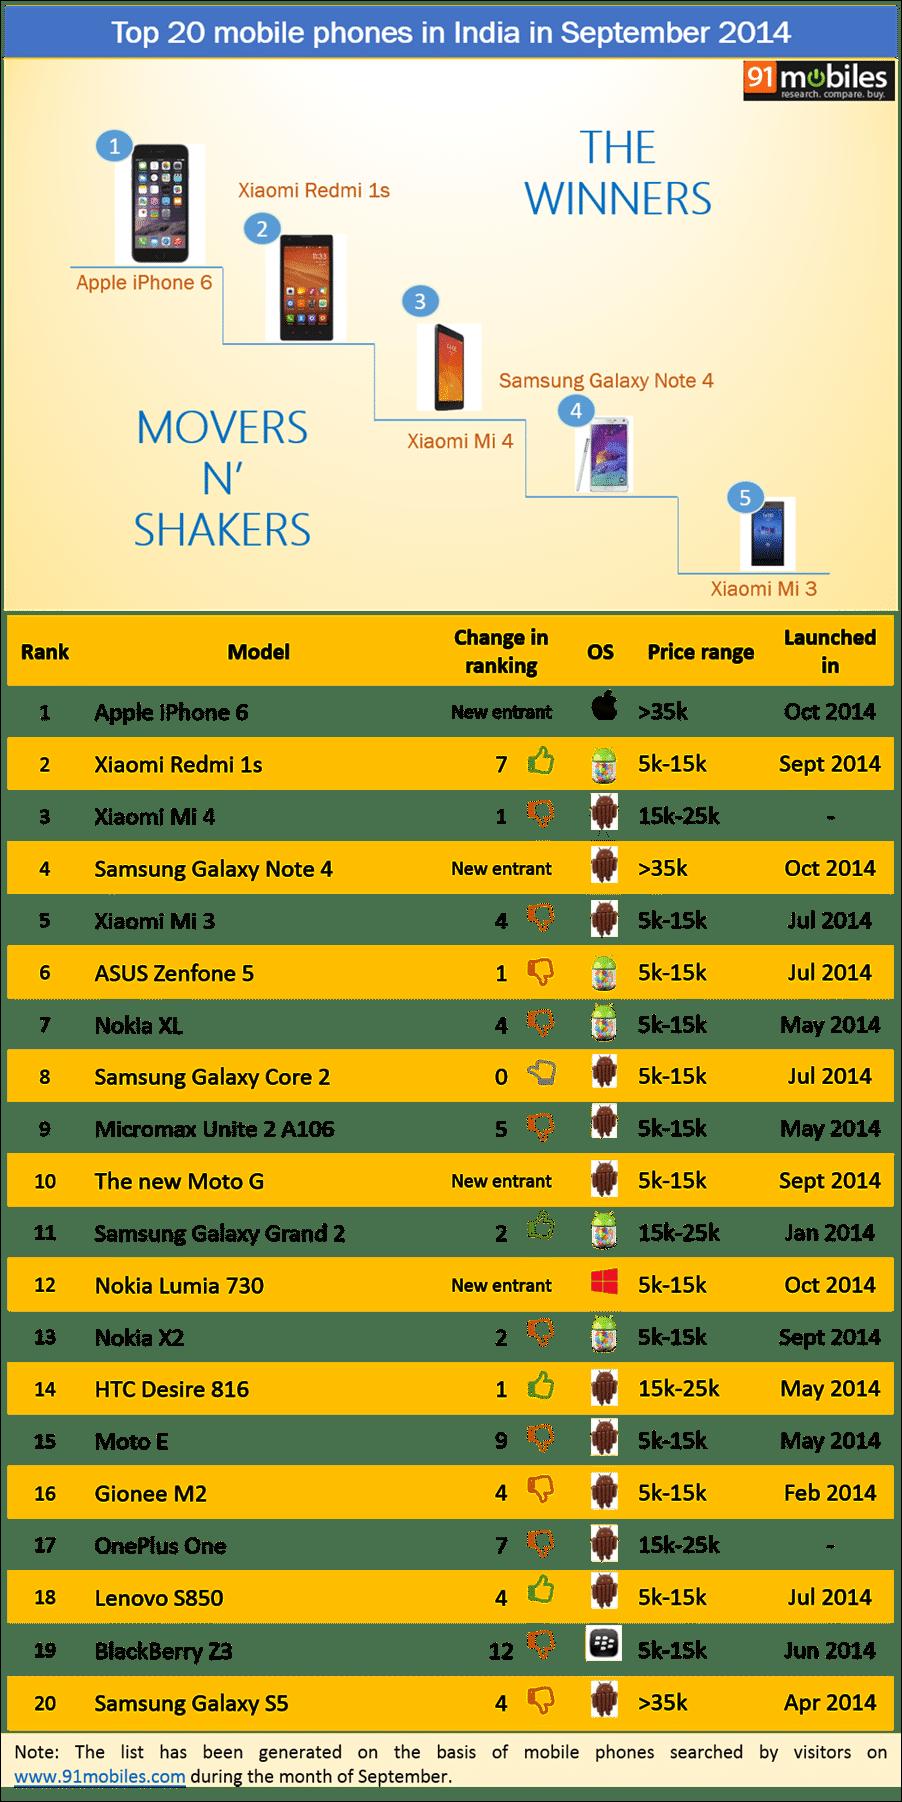 Top 20 mobile phones in India in September 2014